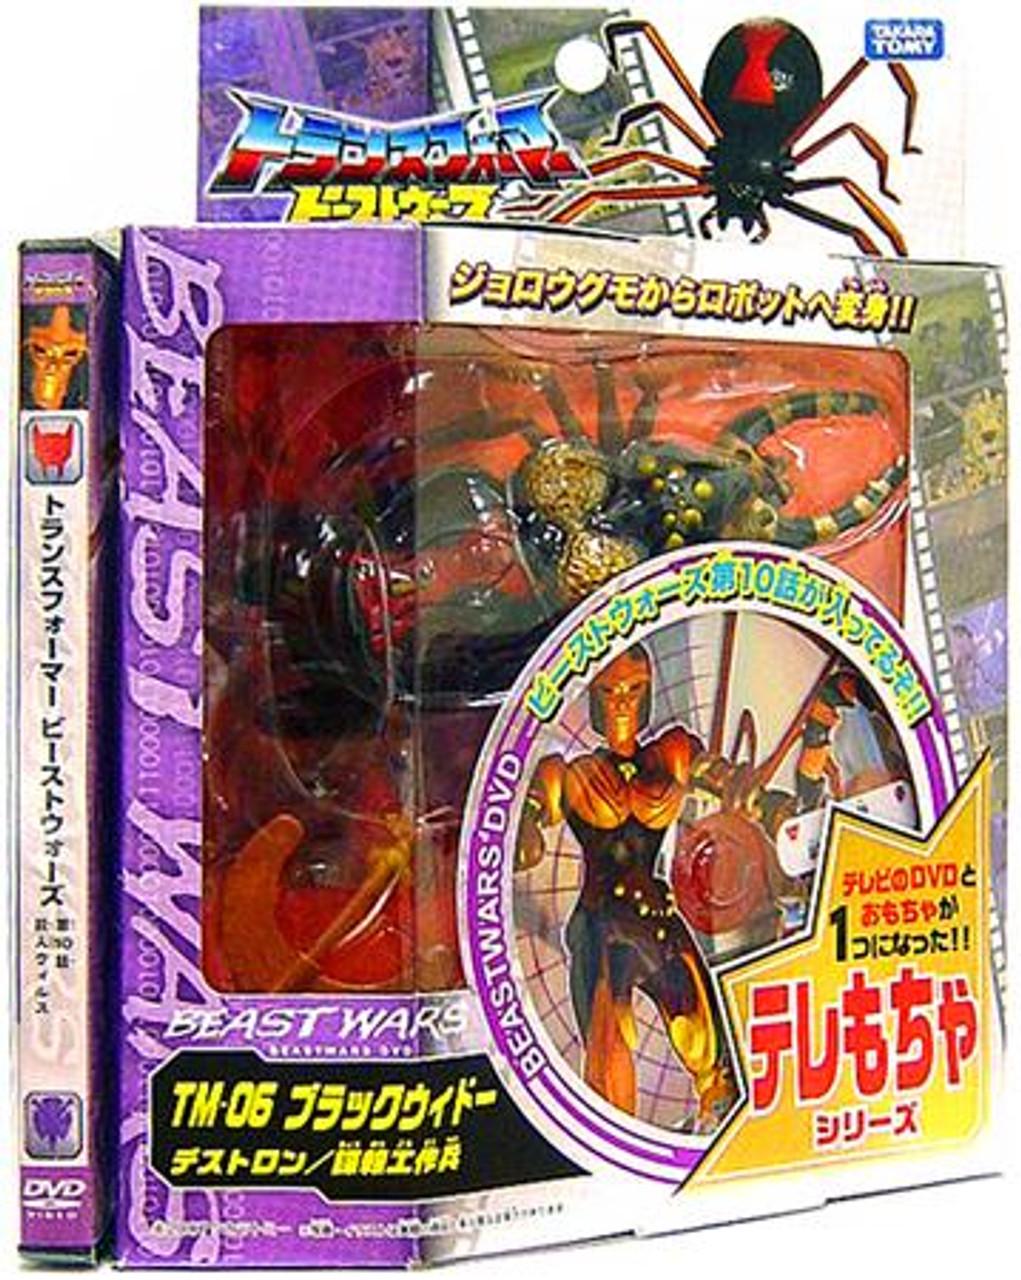 Transformers Japanese Beast Wars 10th Anniversary Blackarachnia Action Figure TM-06